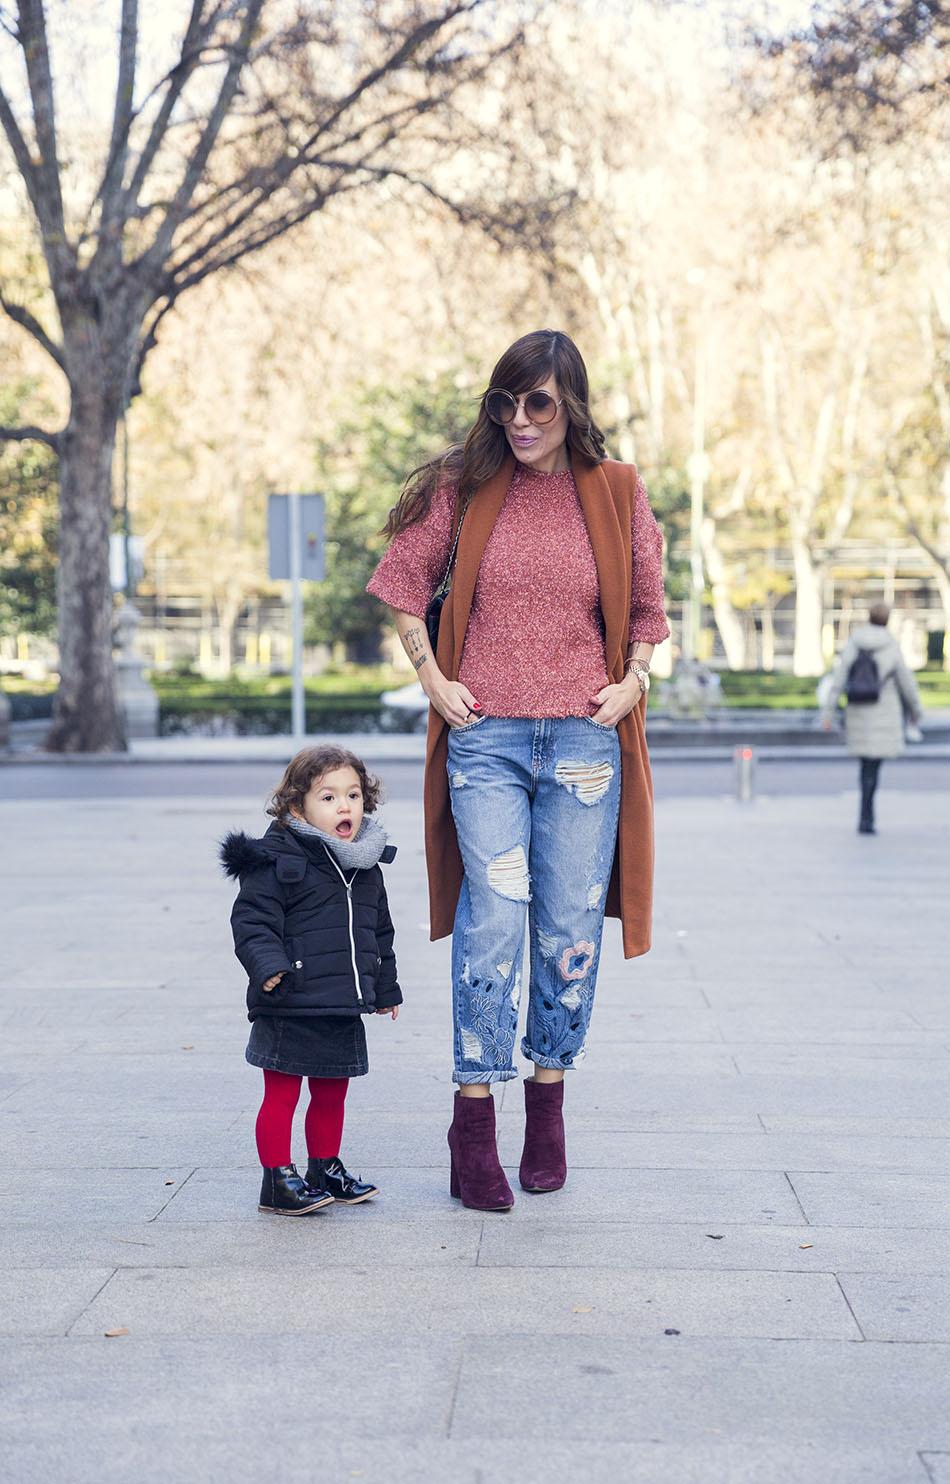 street-style-pura-lopez-boots-chloe-sunglasses-denim-jeans-06